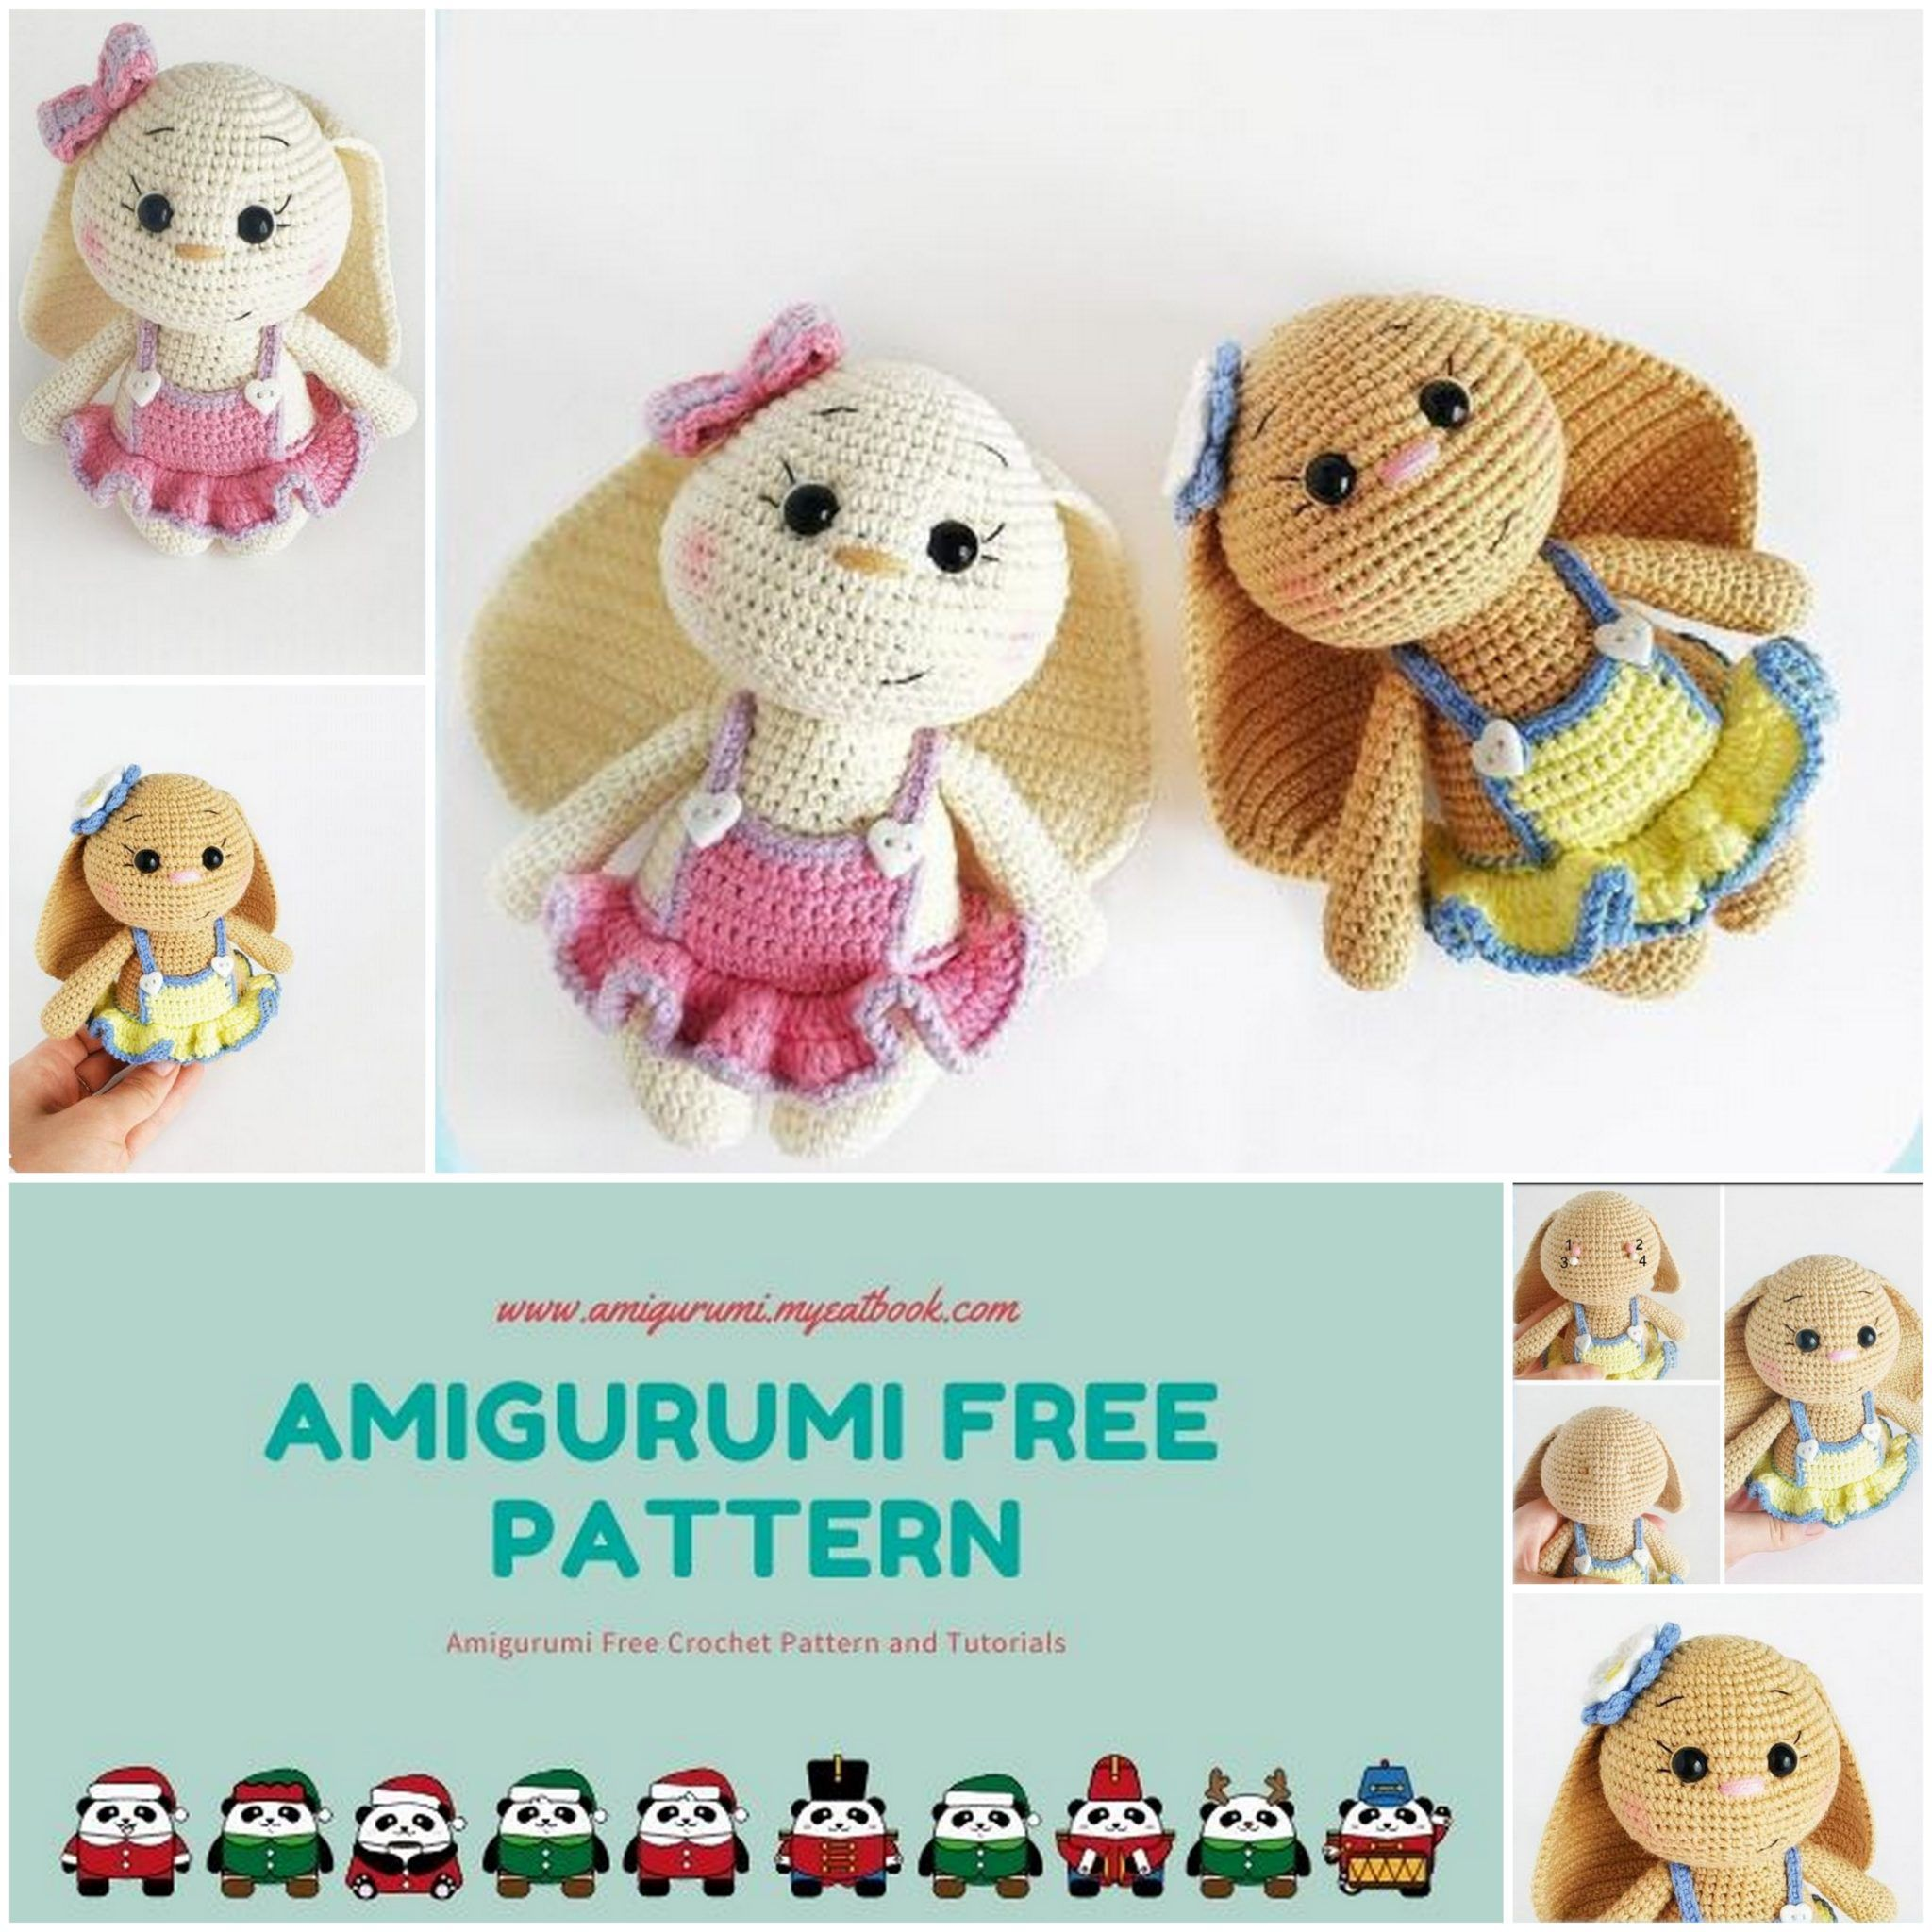 amigurumi bunny pattern free | Artisan Crafts / Dolls, Plushies ... | 2048x2048